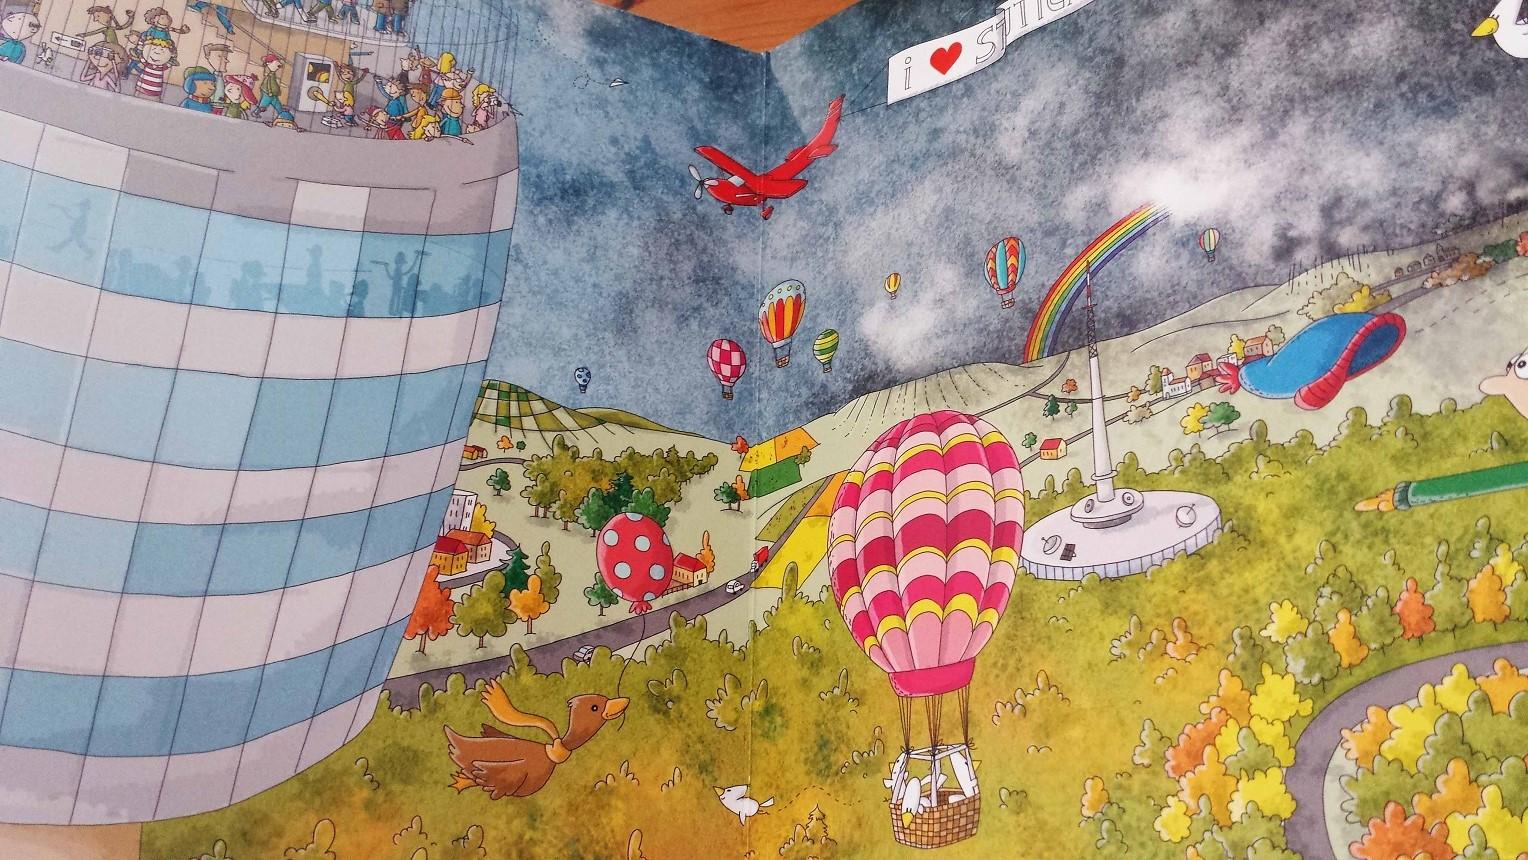 Der Blick aus den Ballons muss atemberaubend sein...wow!